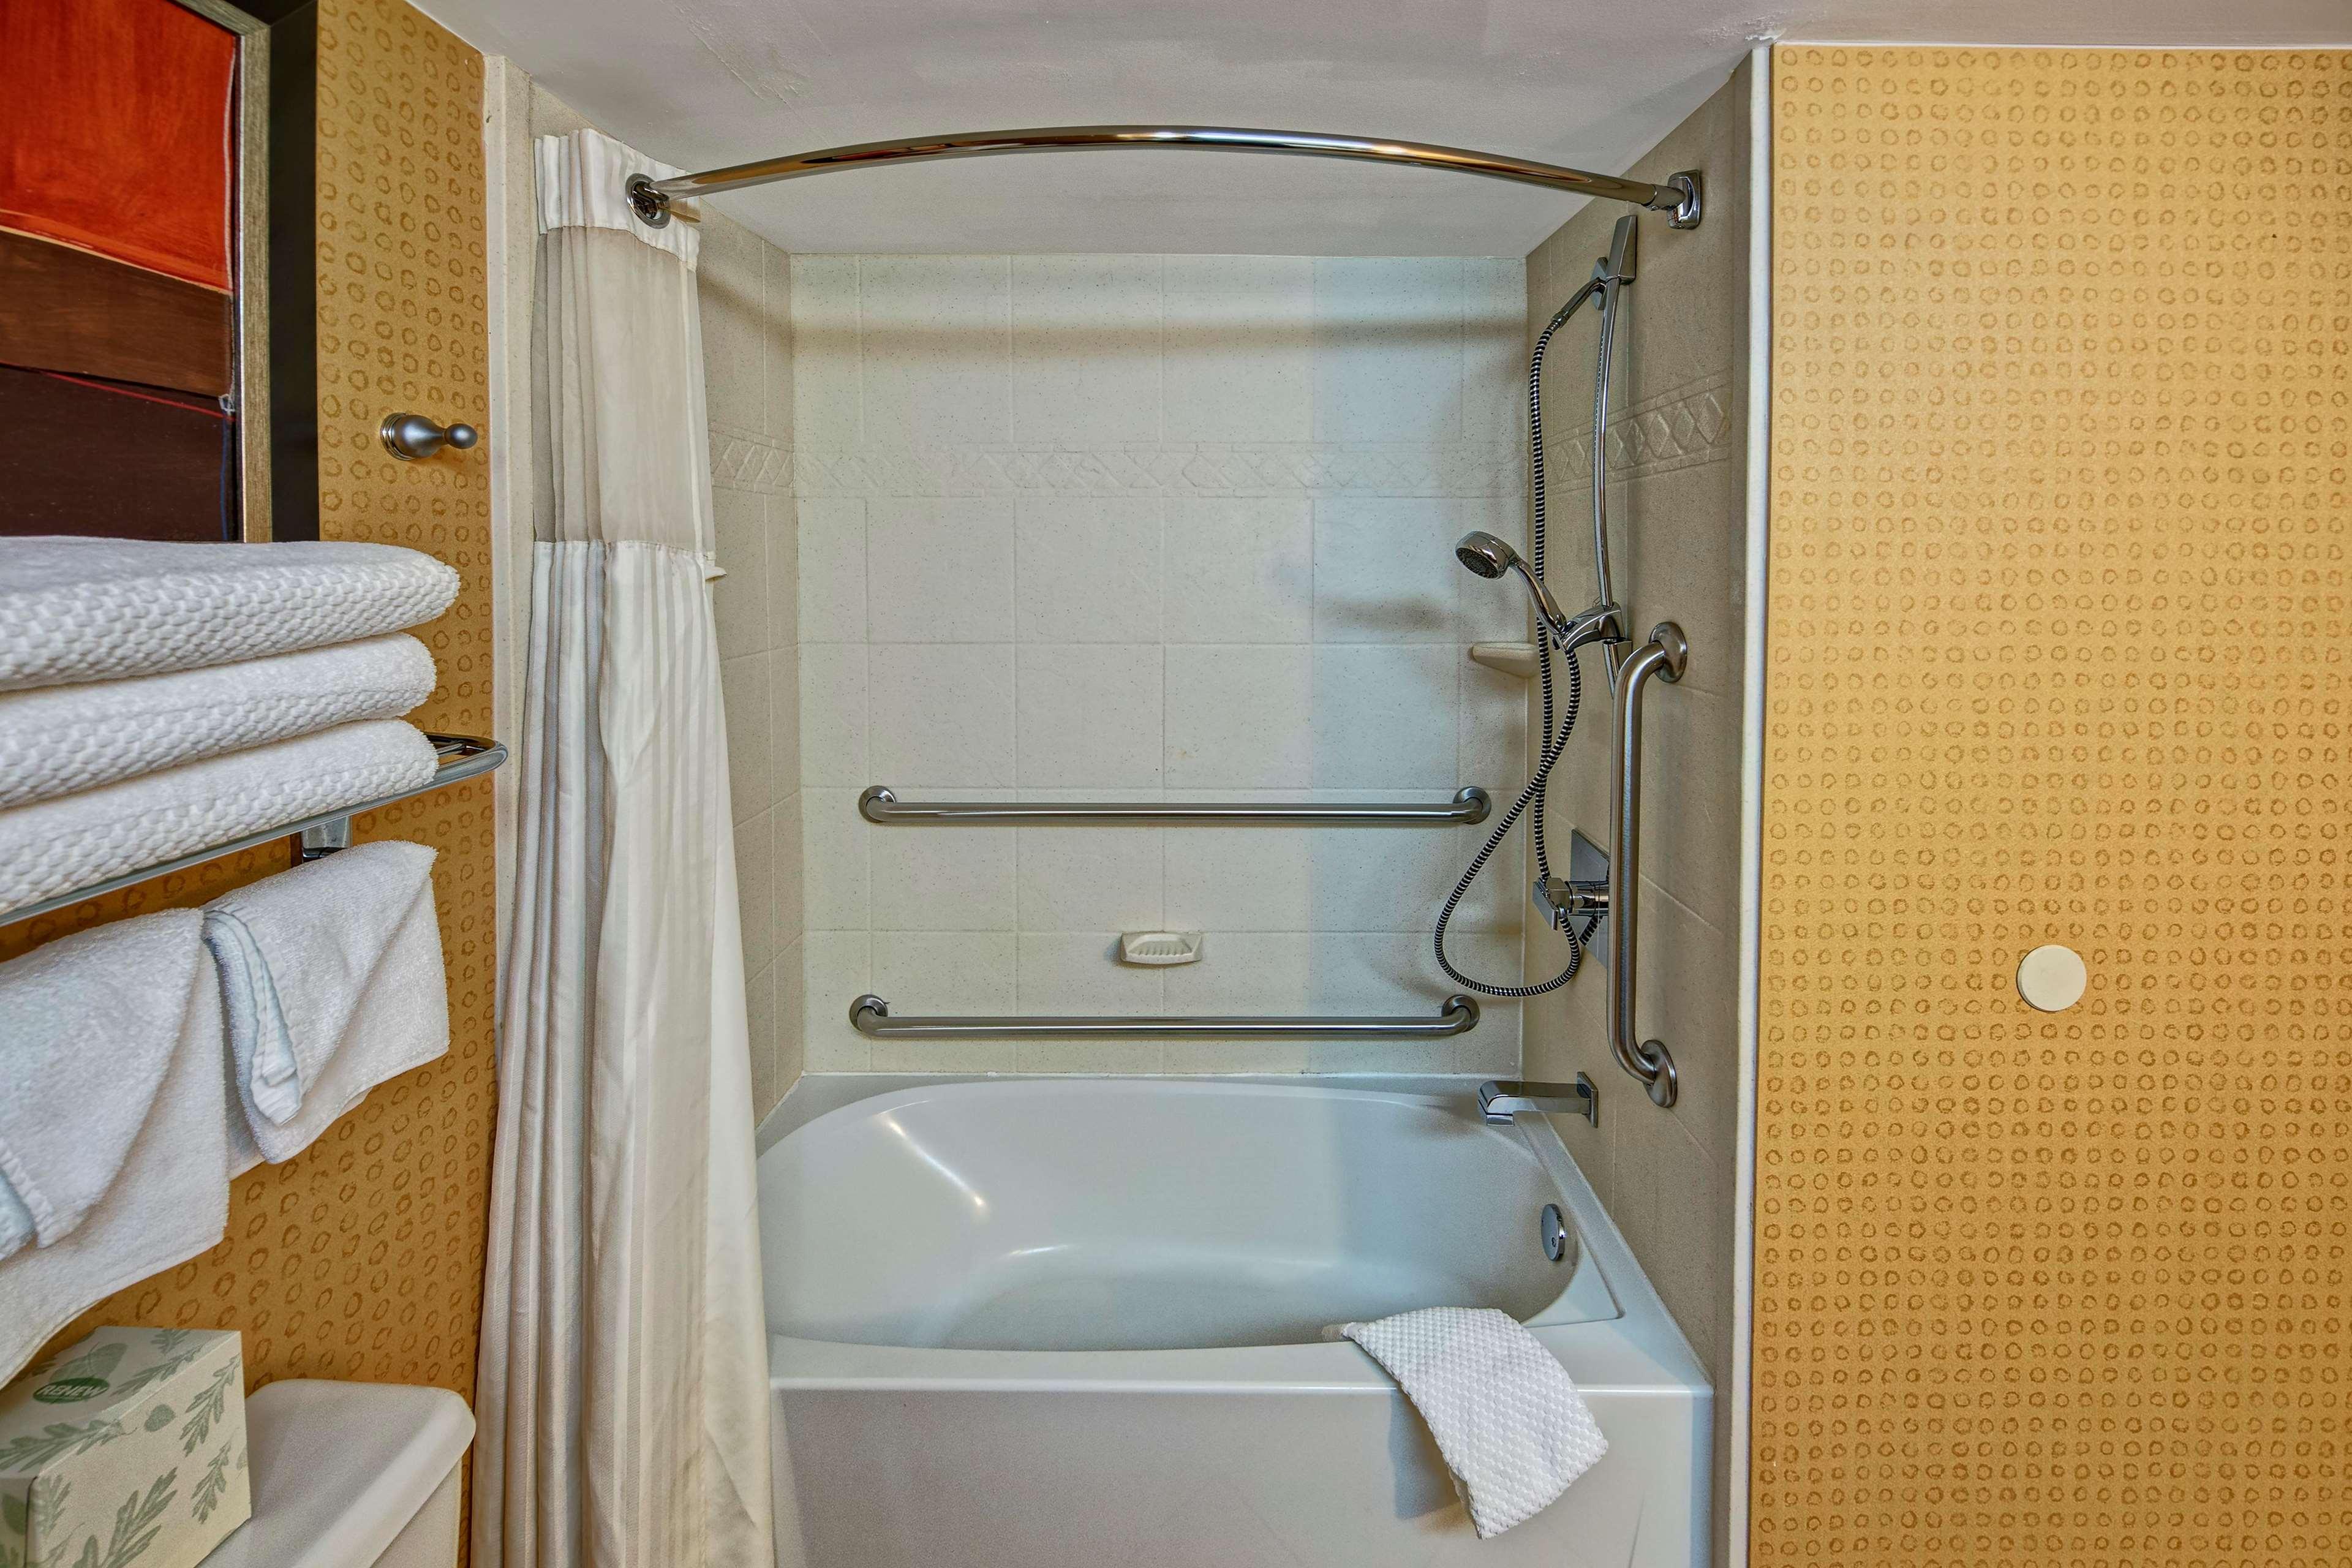 DoubleTree by Hilton Hotel Oak Ridge - Knoxville image 32